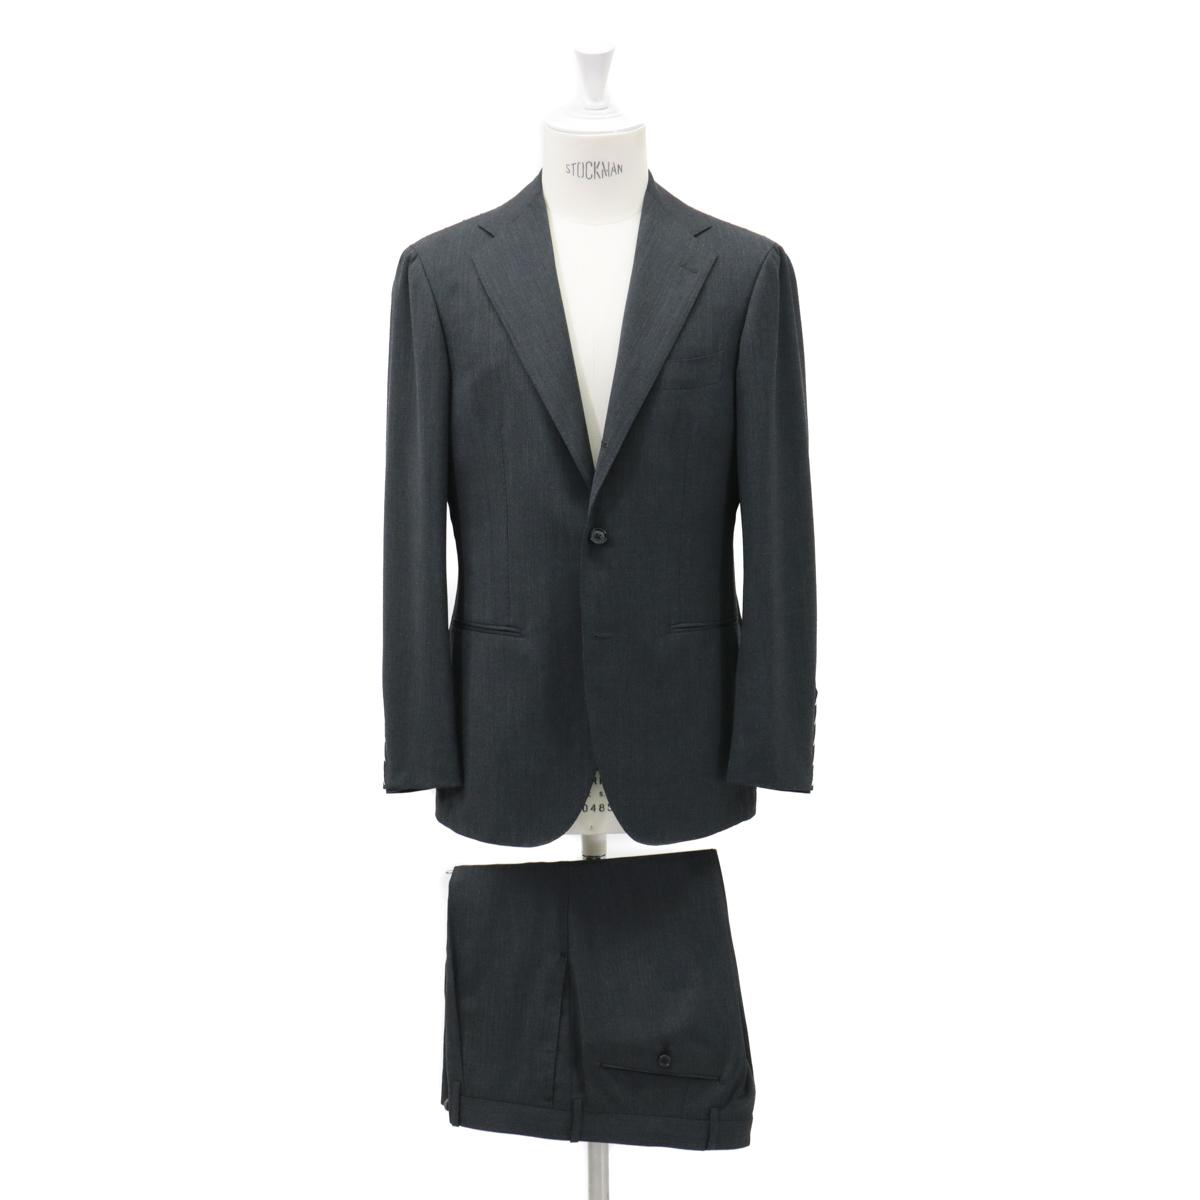 RING JACKET リングヂャケットModel No-253EH S-172HHIGH TWIST3Bスーツ【無地・チャコールグレー】